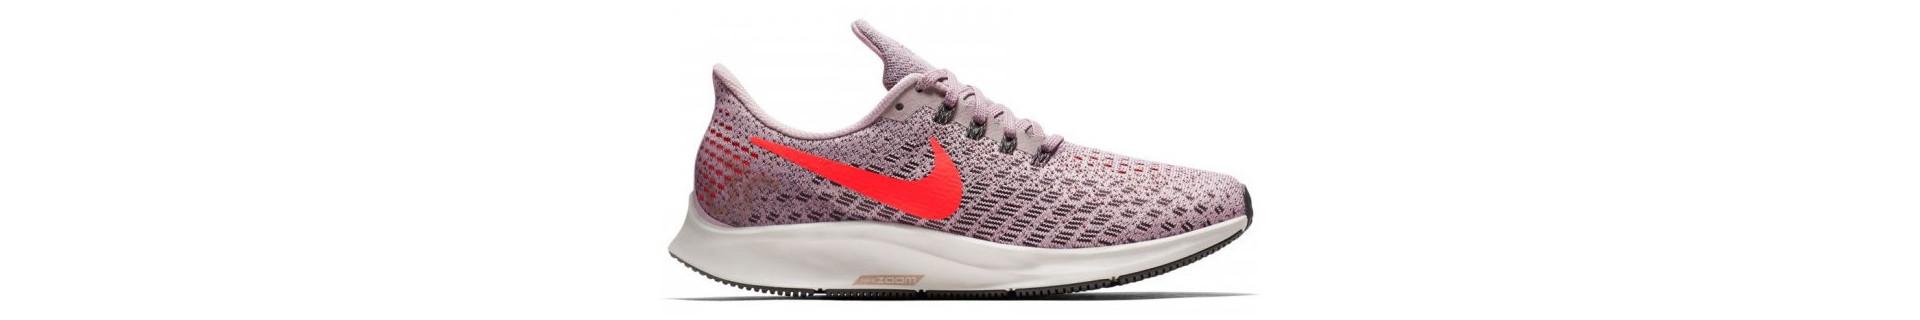 Zapatillas running para mujer, adidas, nike, reebok, sketchers.